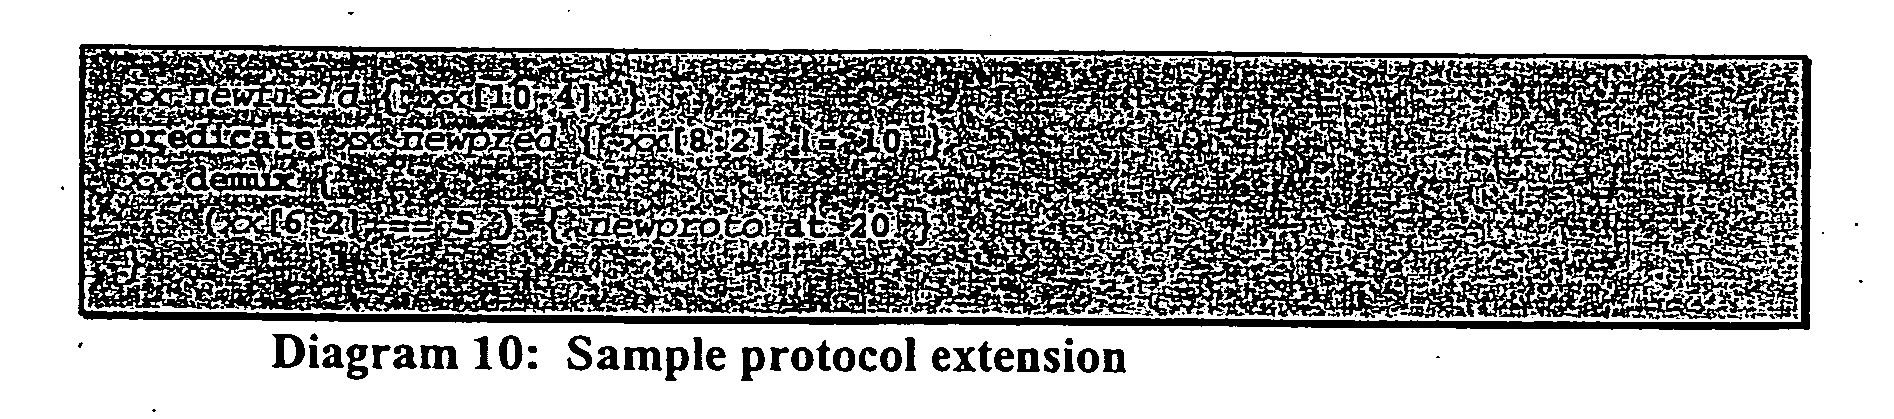 Figure US20040148382A1-20040729-P00012